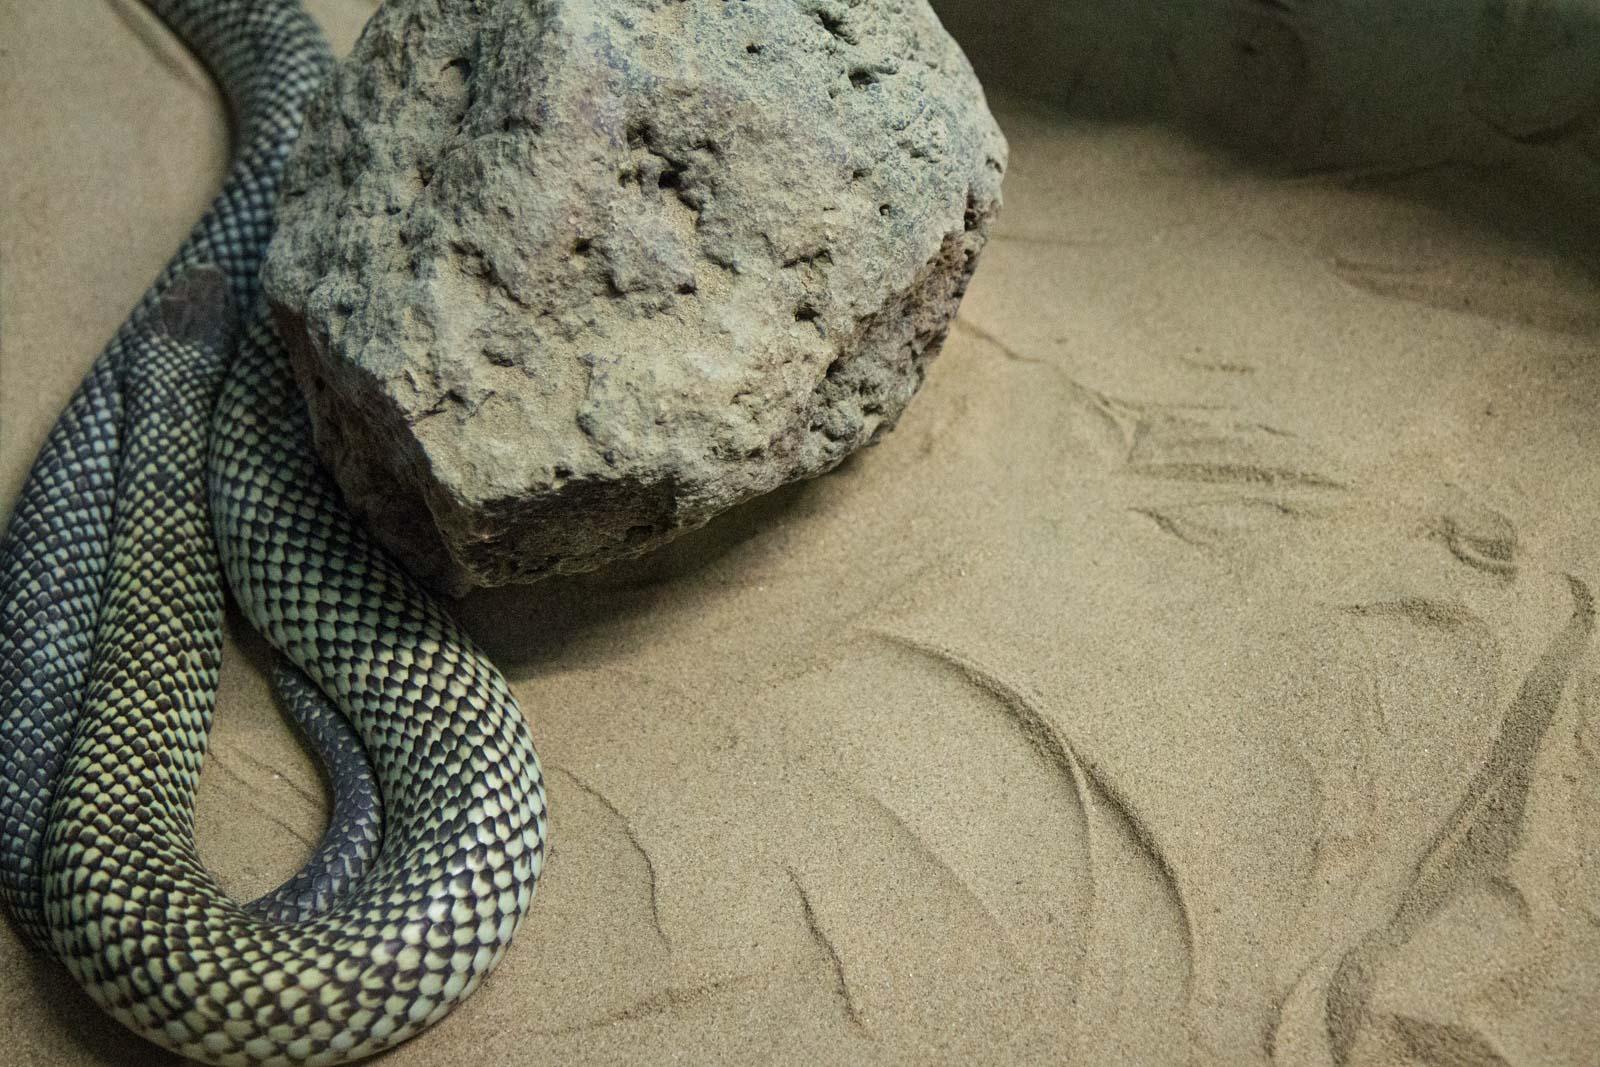 Snakes Downunder Reptile Park, Childers, Queensland, Australia